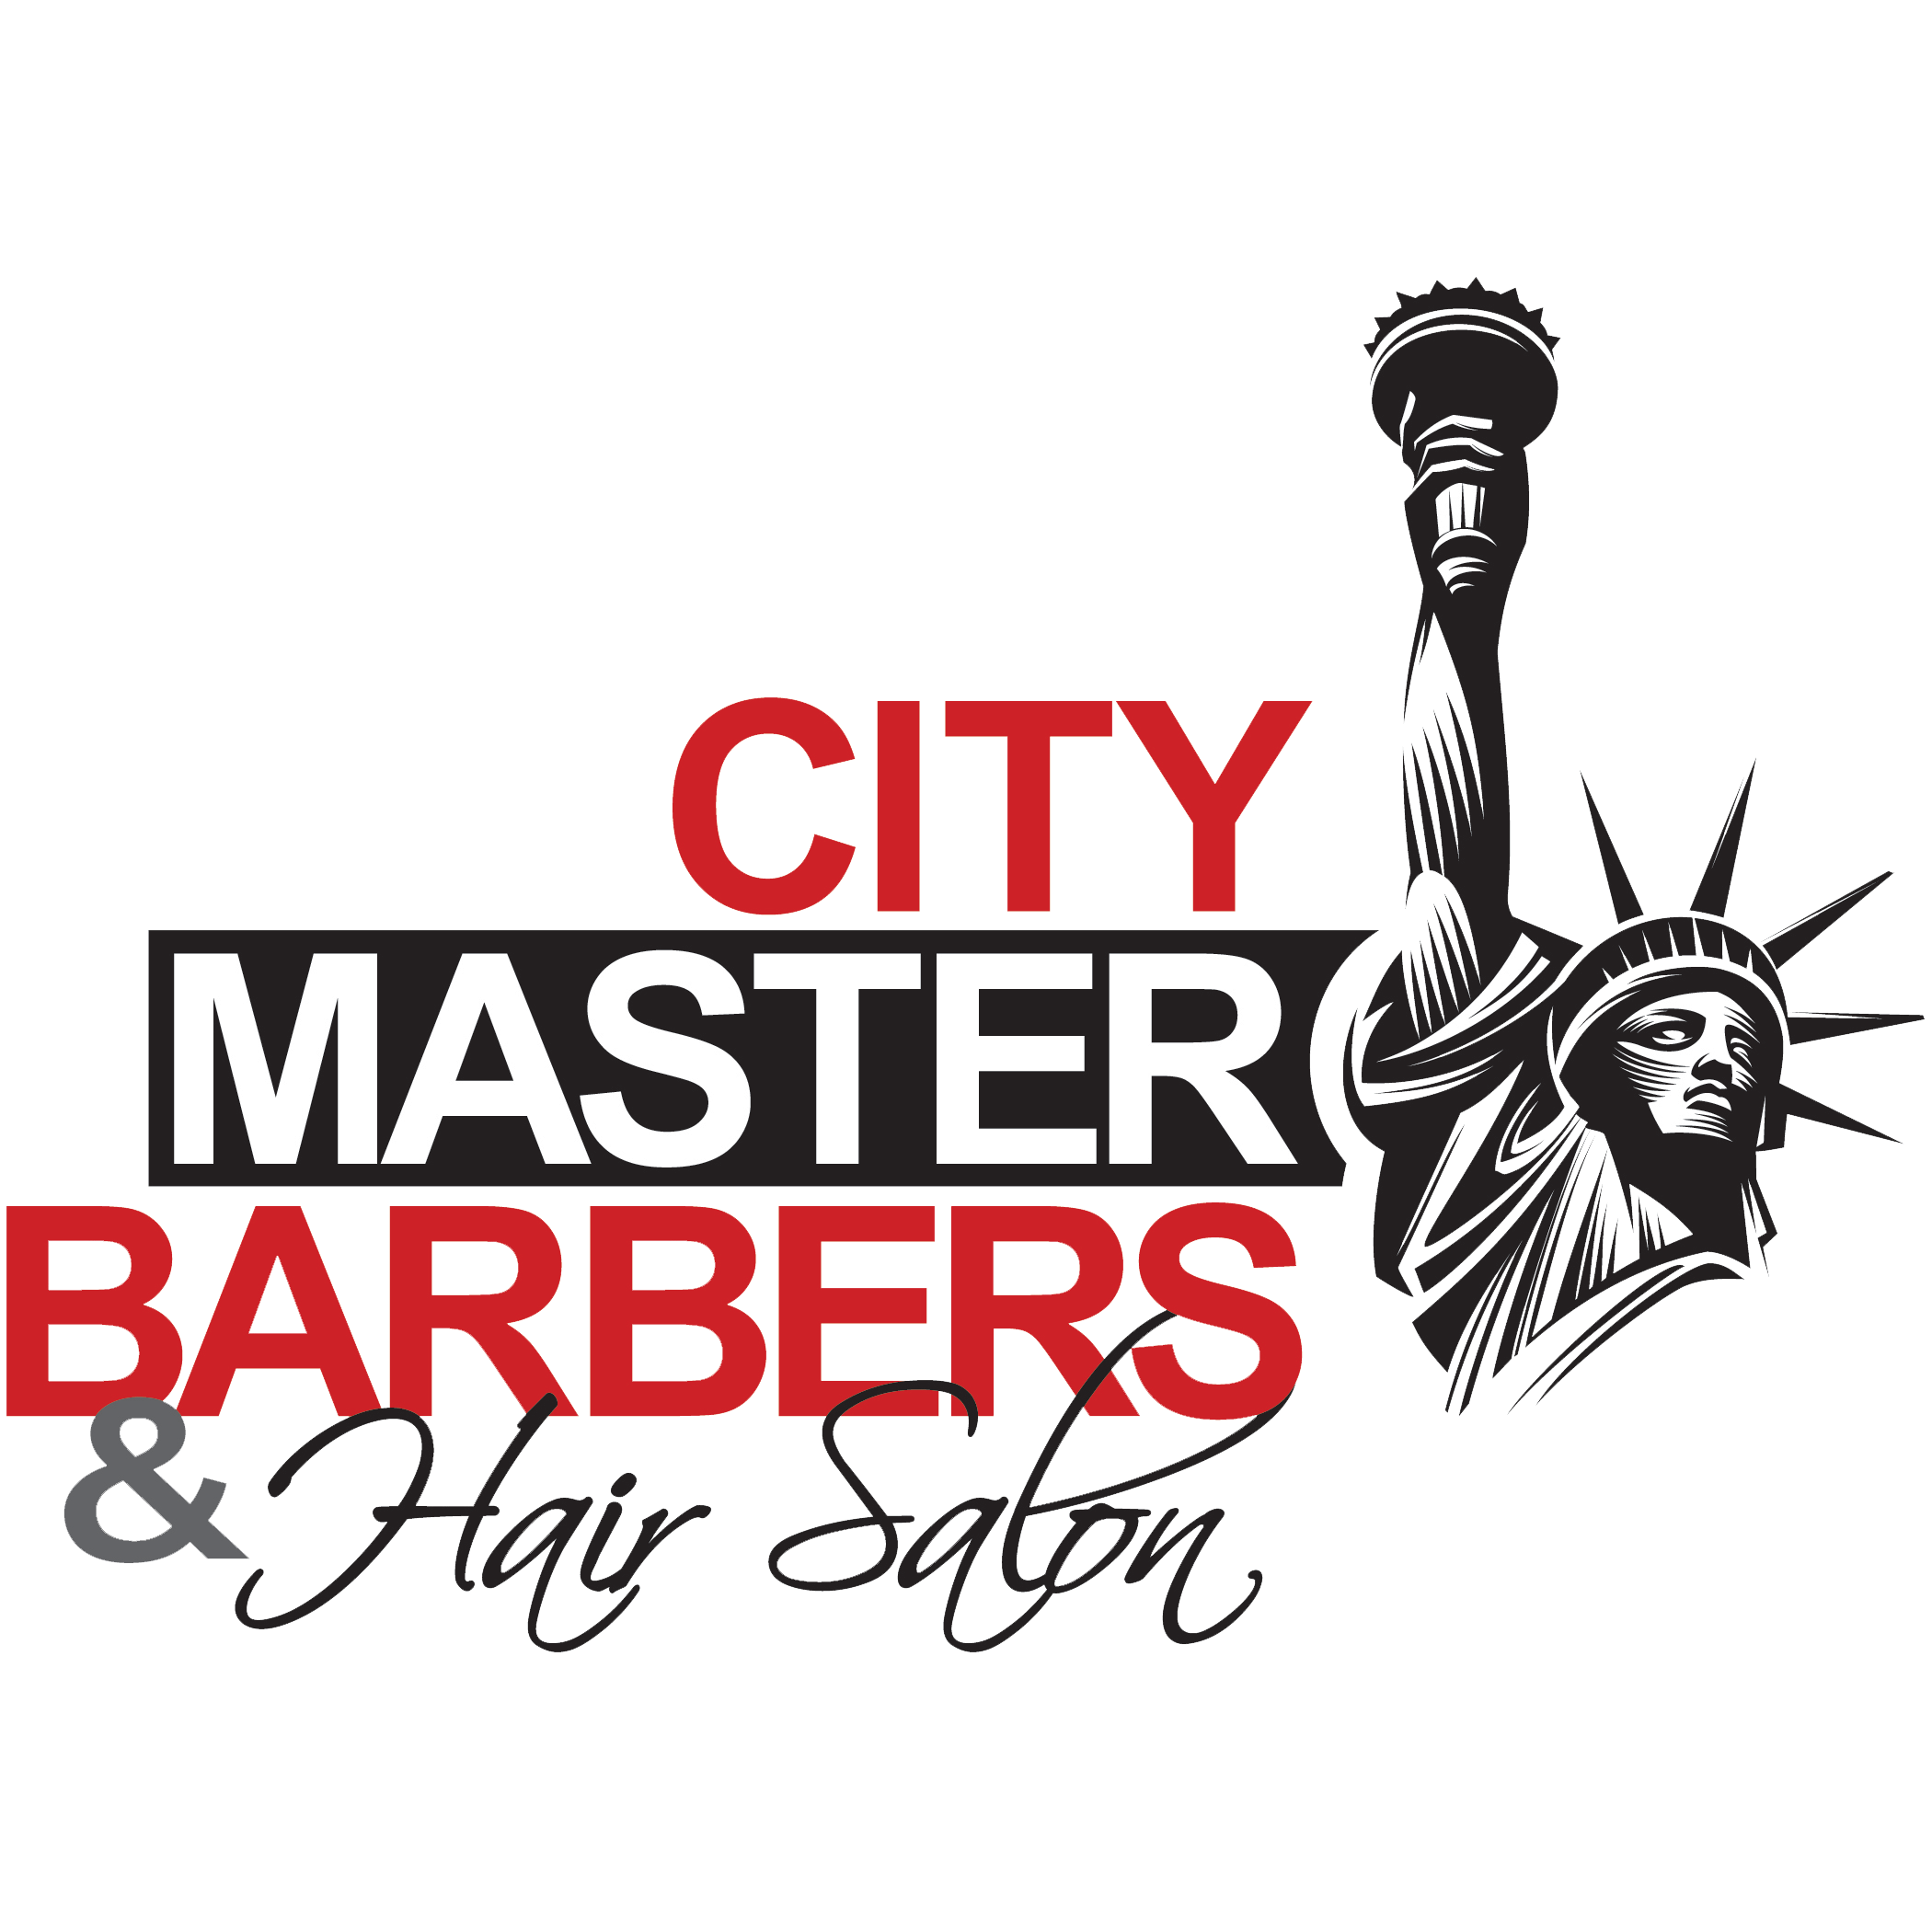 City Master Barbers